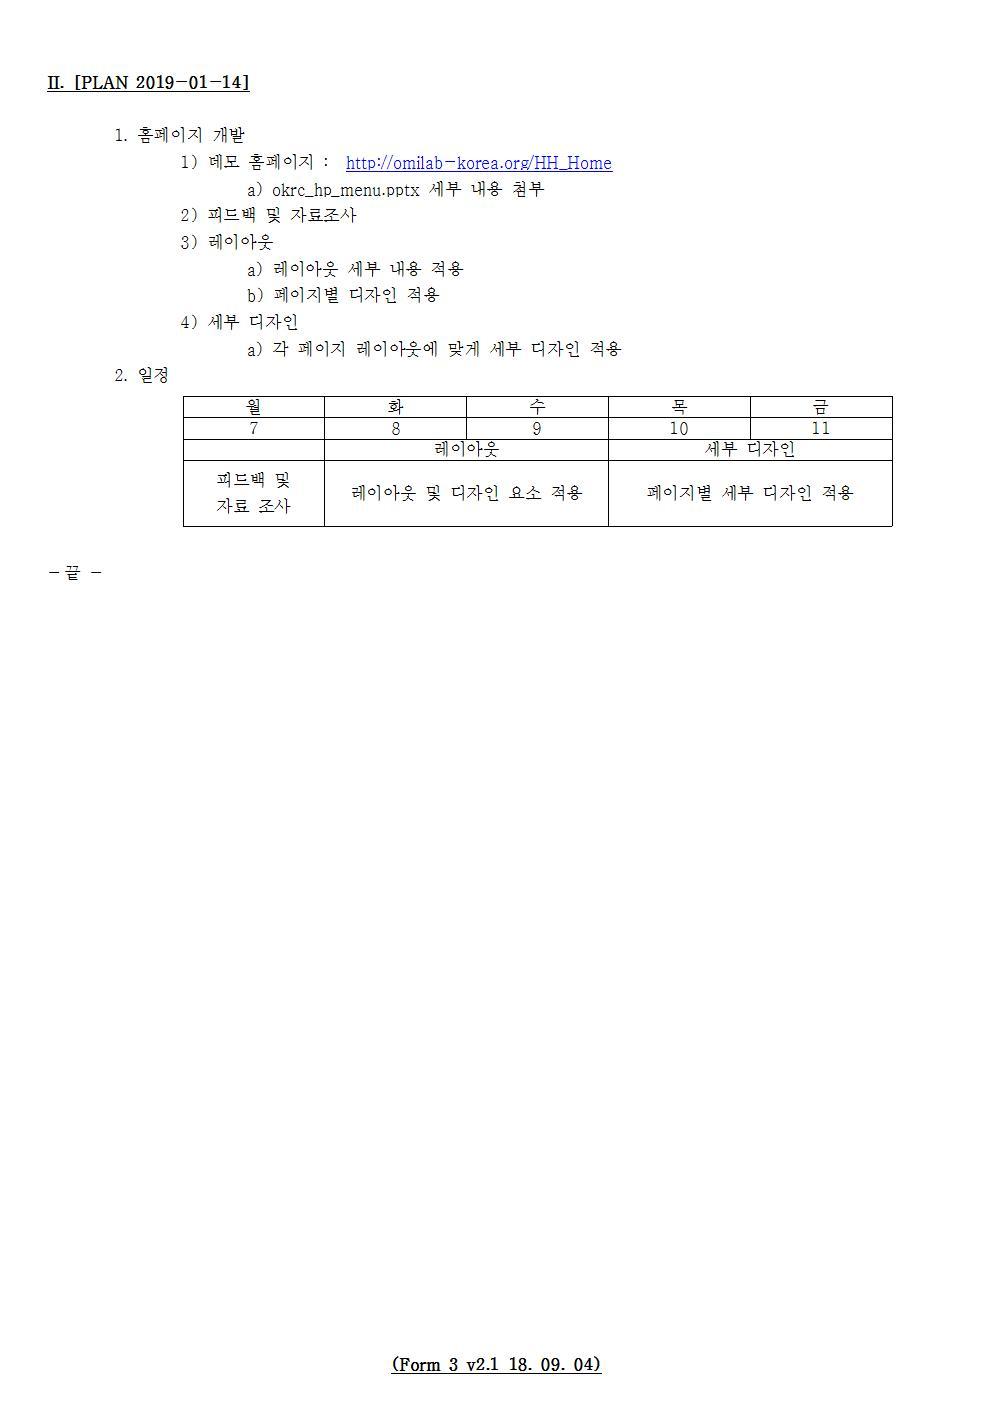 D-[19-021-RC-03]-[OKRCHP V2.0]-[2019-01-14][HH]002.jpg